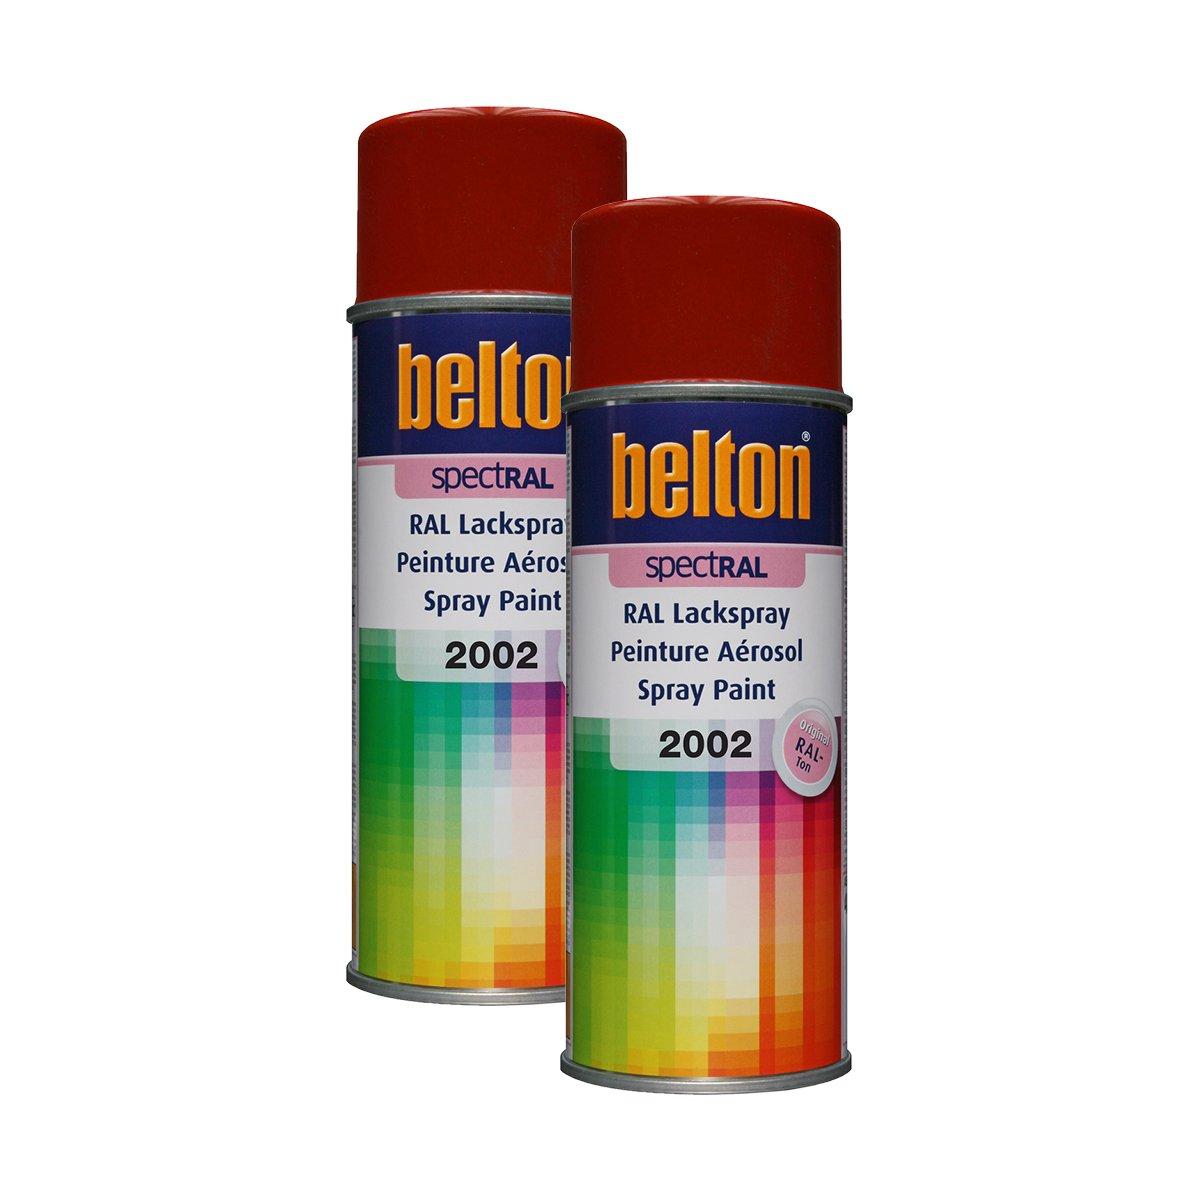 Kwasny 2 x 324 030 Belton Spectral Lackspray RAL 2002 blutorange Hochglanz 400ml